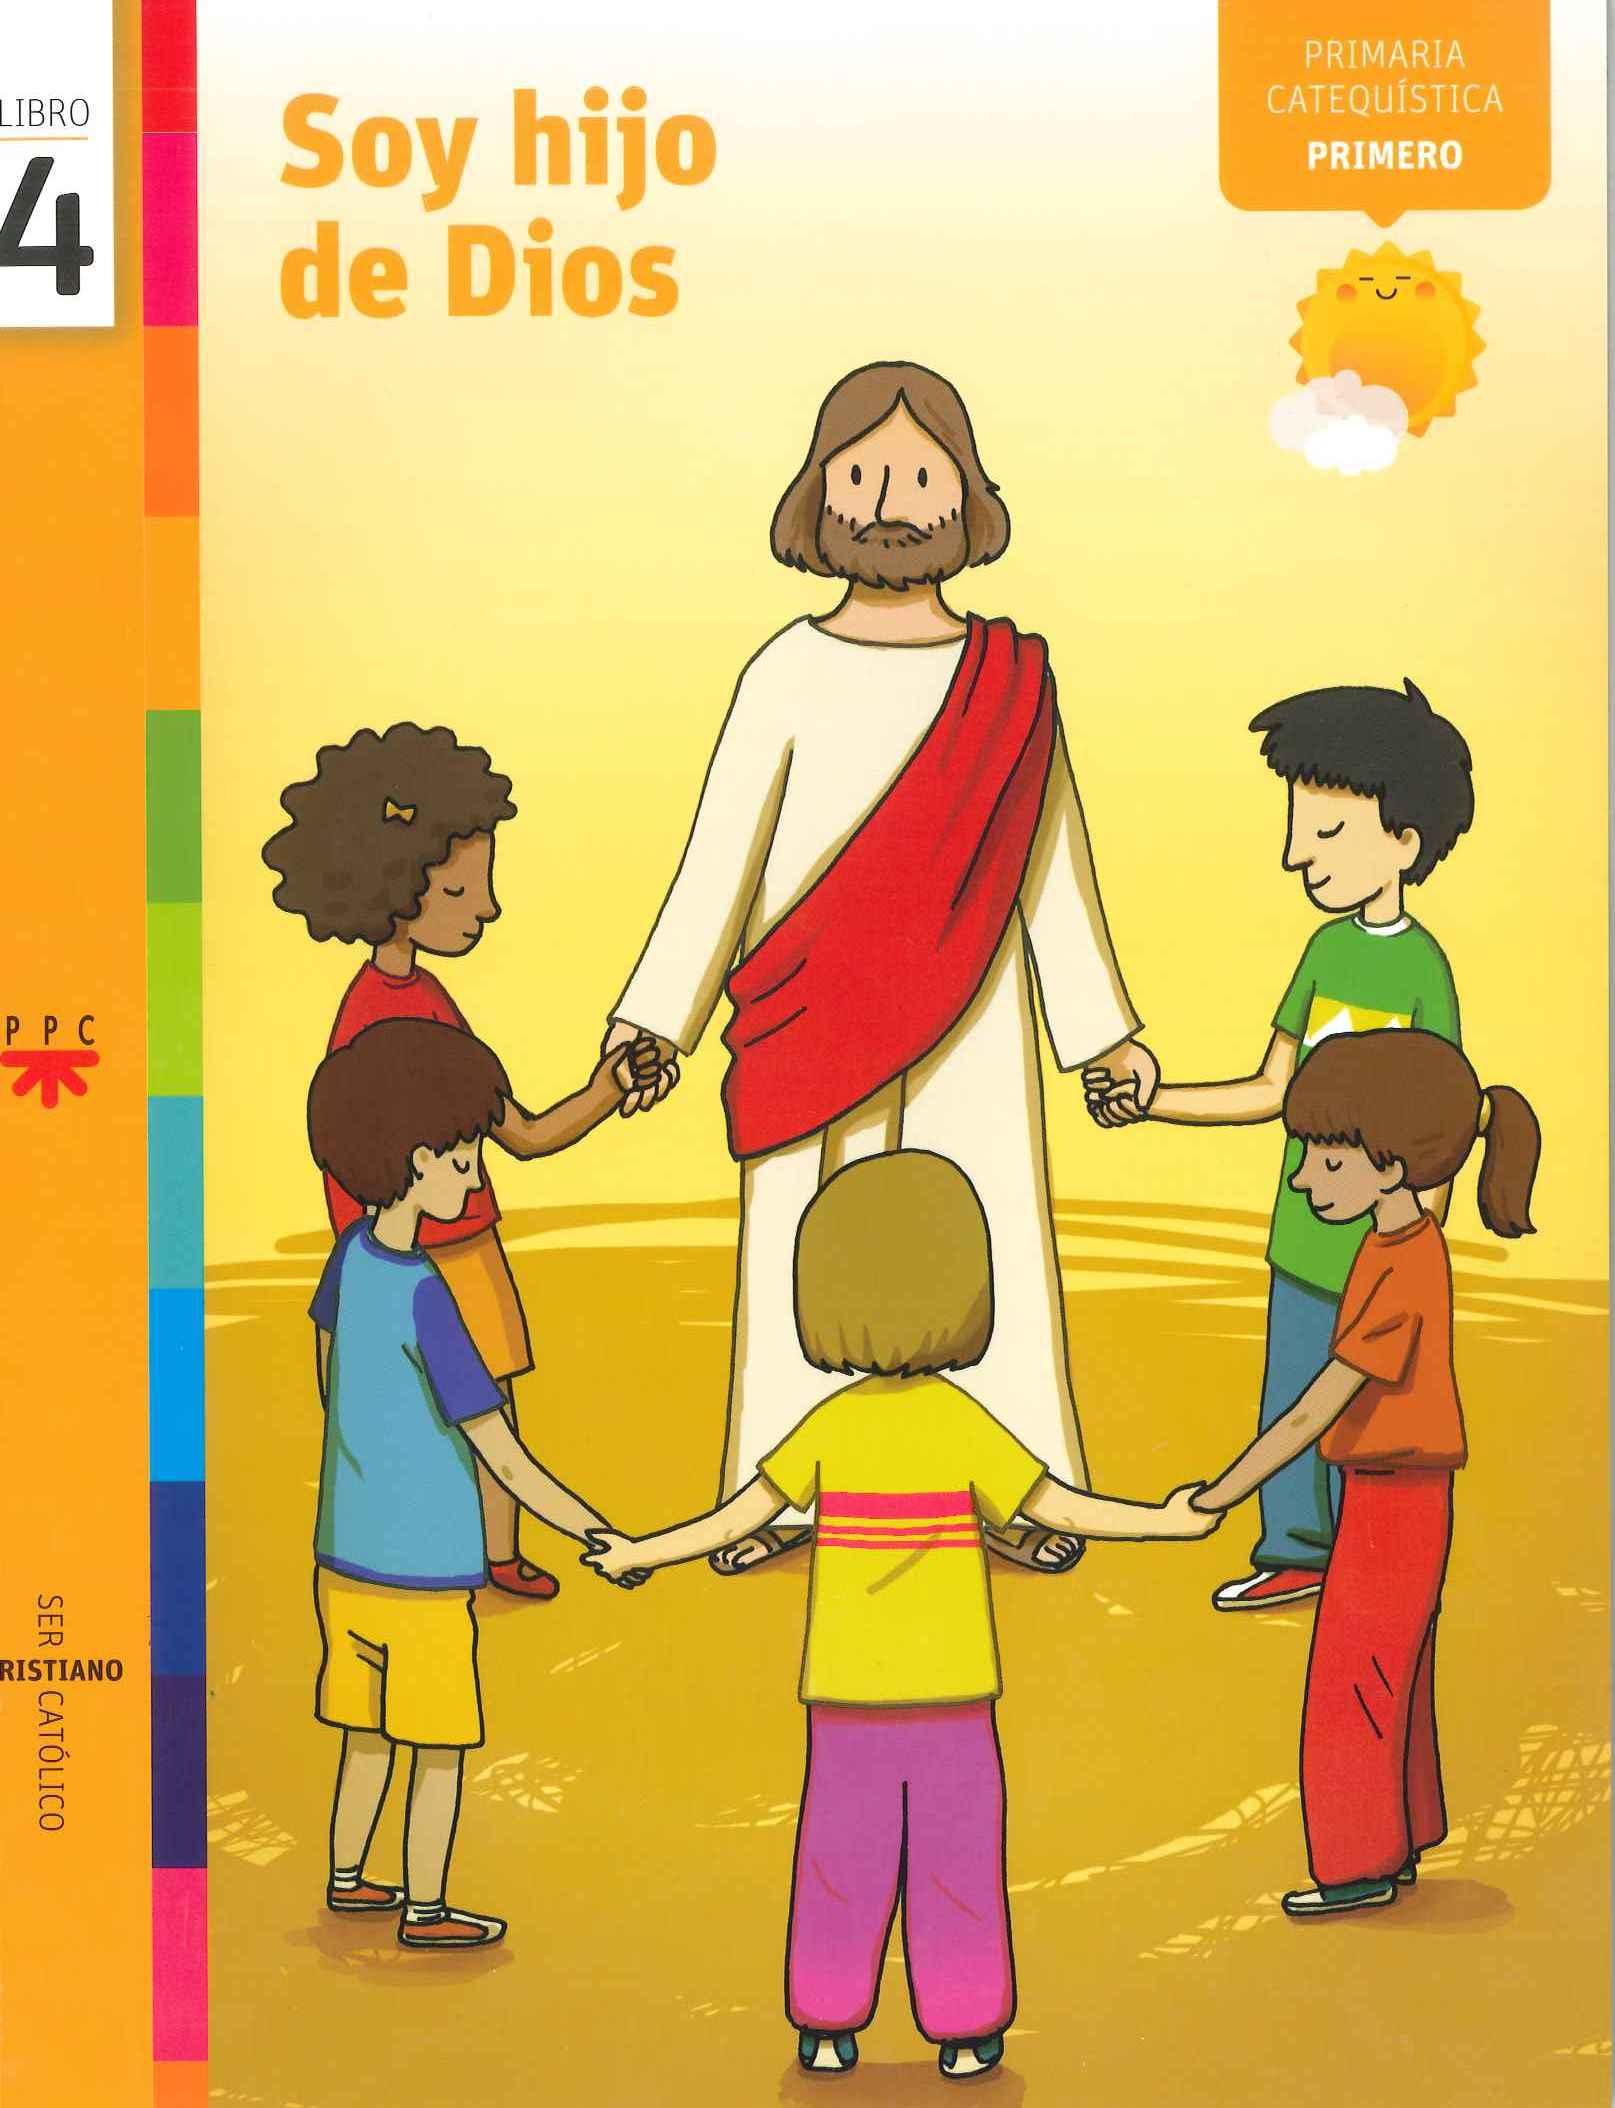 Soy hijo de Dios, 4. Ser cristiano católico